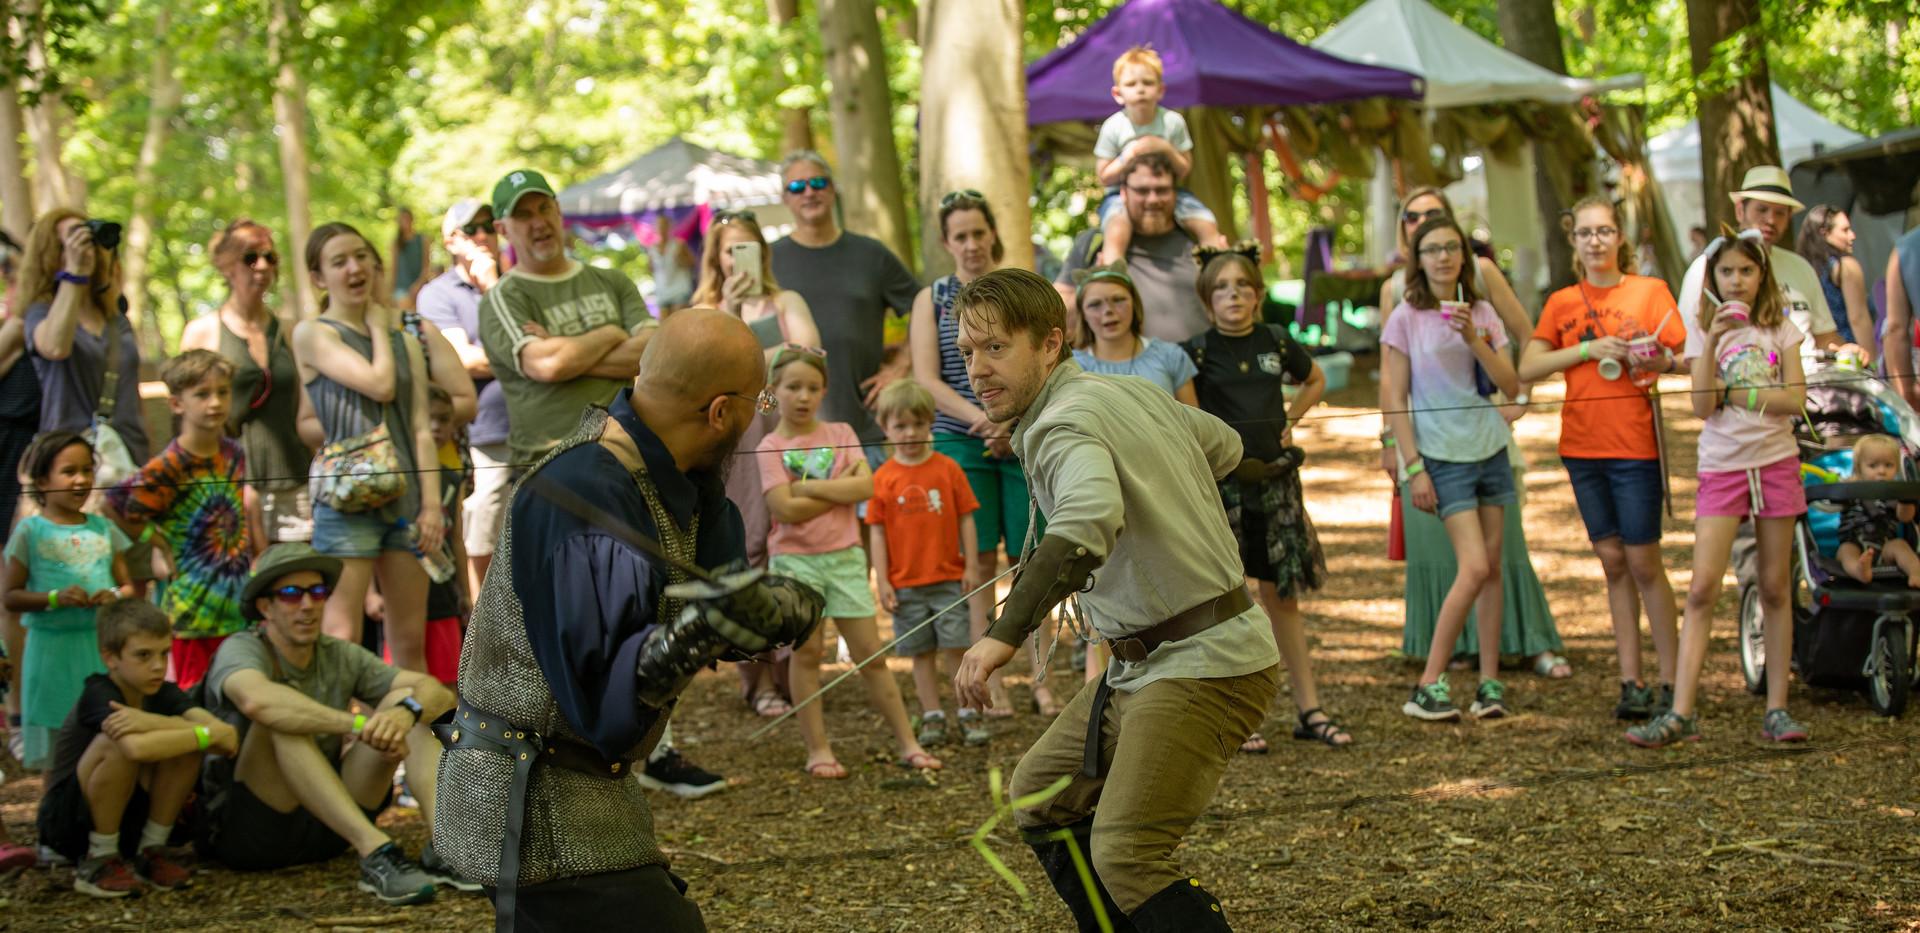 swordfighting.jpg